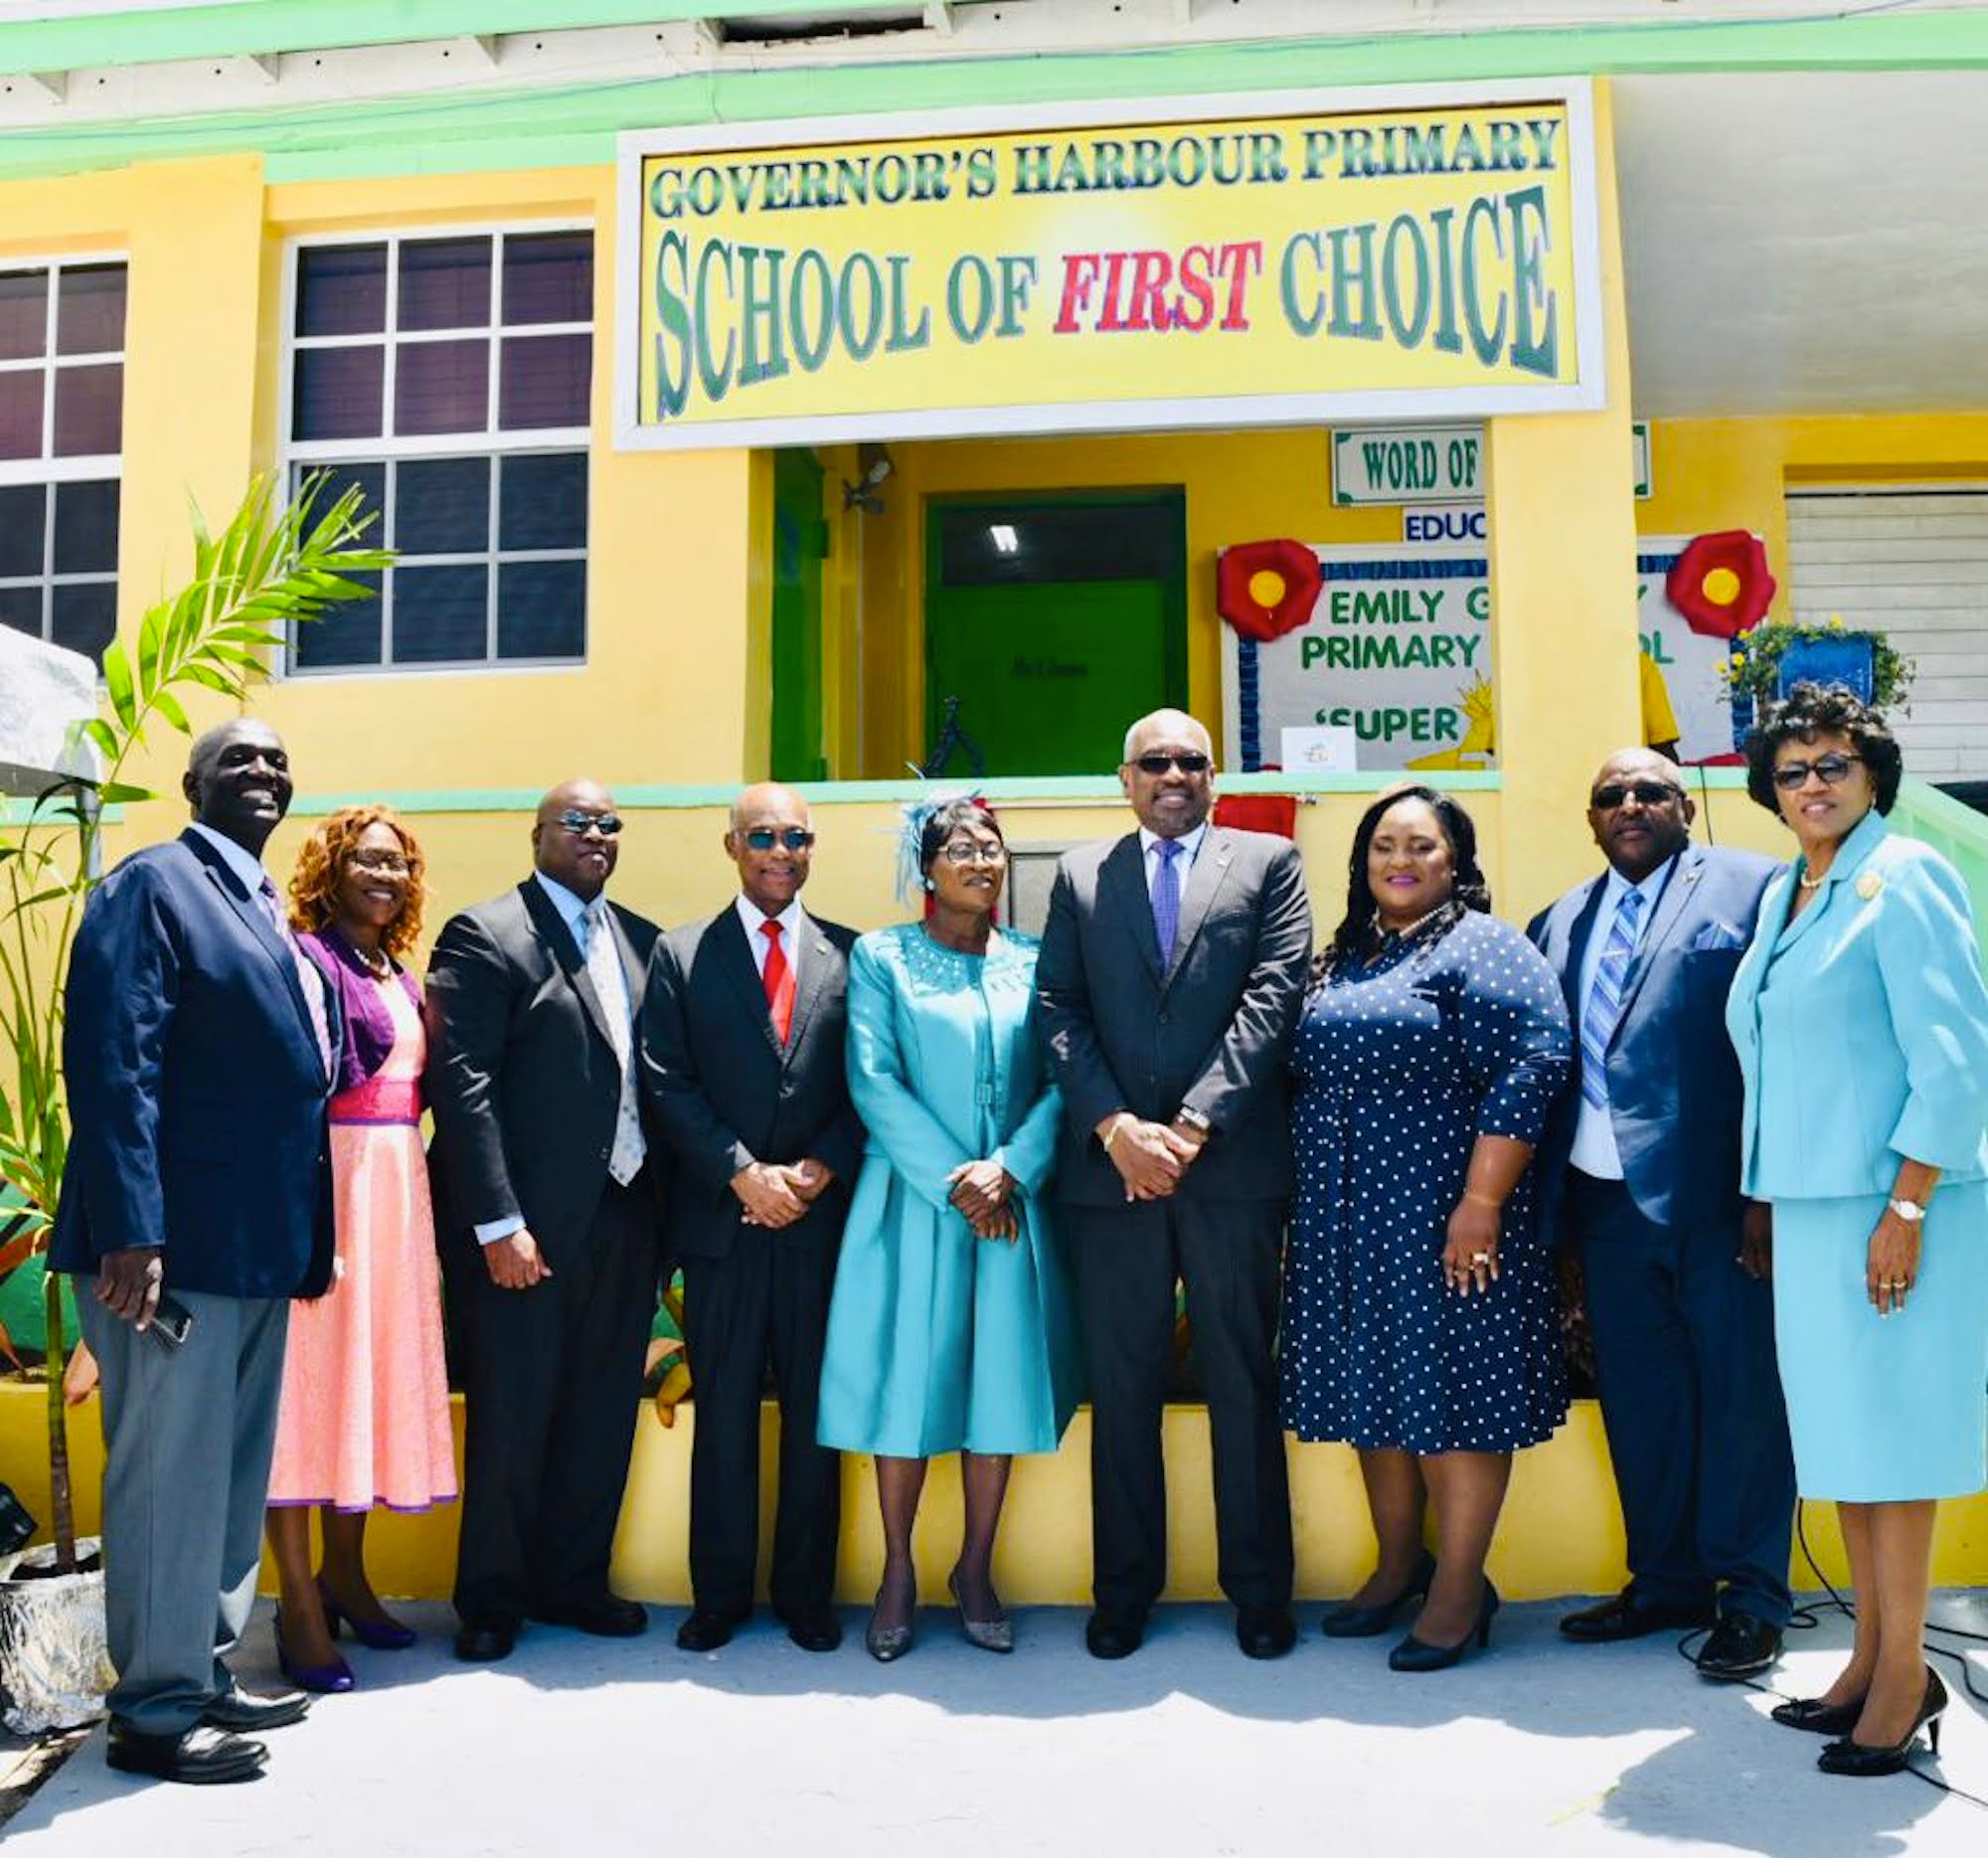 Governor's Harbour Primary School renamed Emily Georgenia Petty Primary School